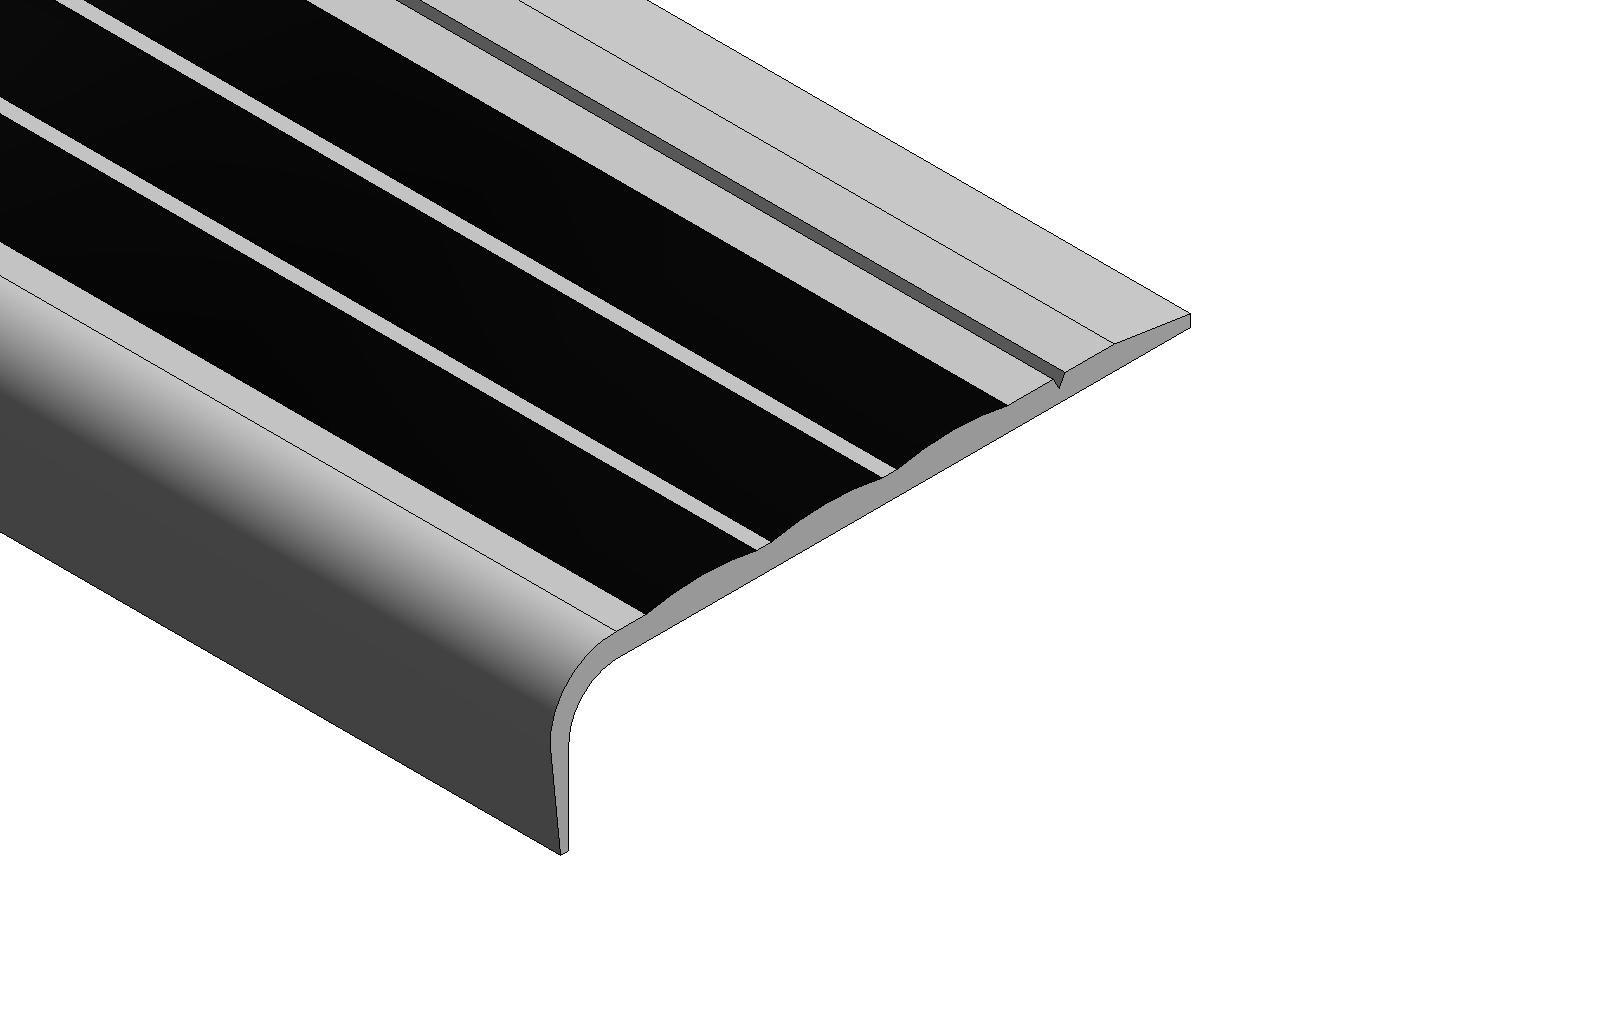 Building Product Non Slip Carpet Stair Nosing 102E26E Arcat | Carpet Stair No Slip Nosing | Stair Tread Nosing | Strips | Non Skid | Laminate Flooring | Gravel